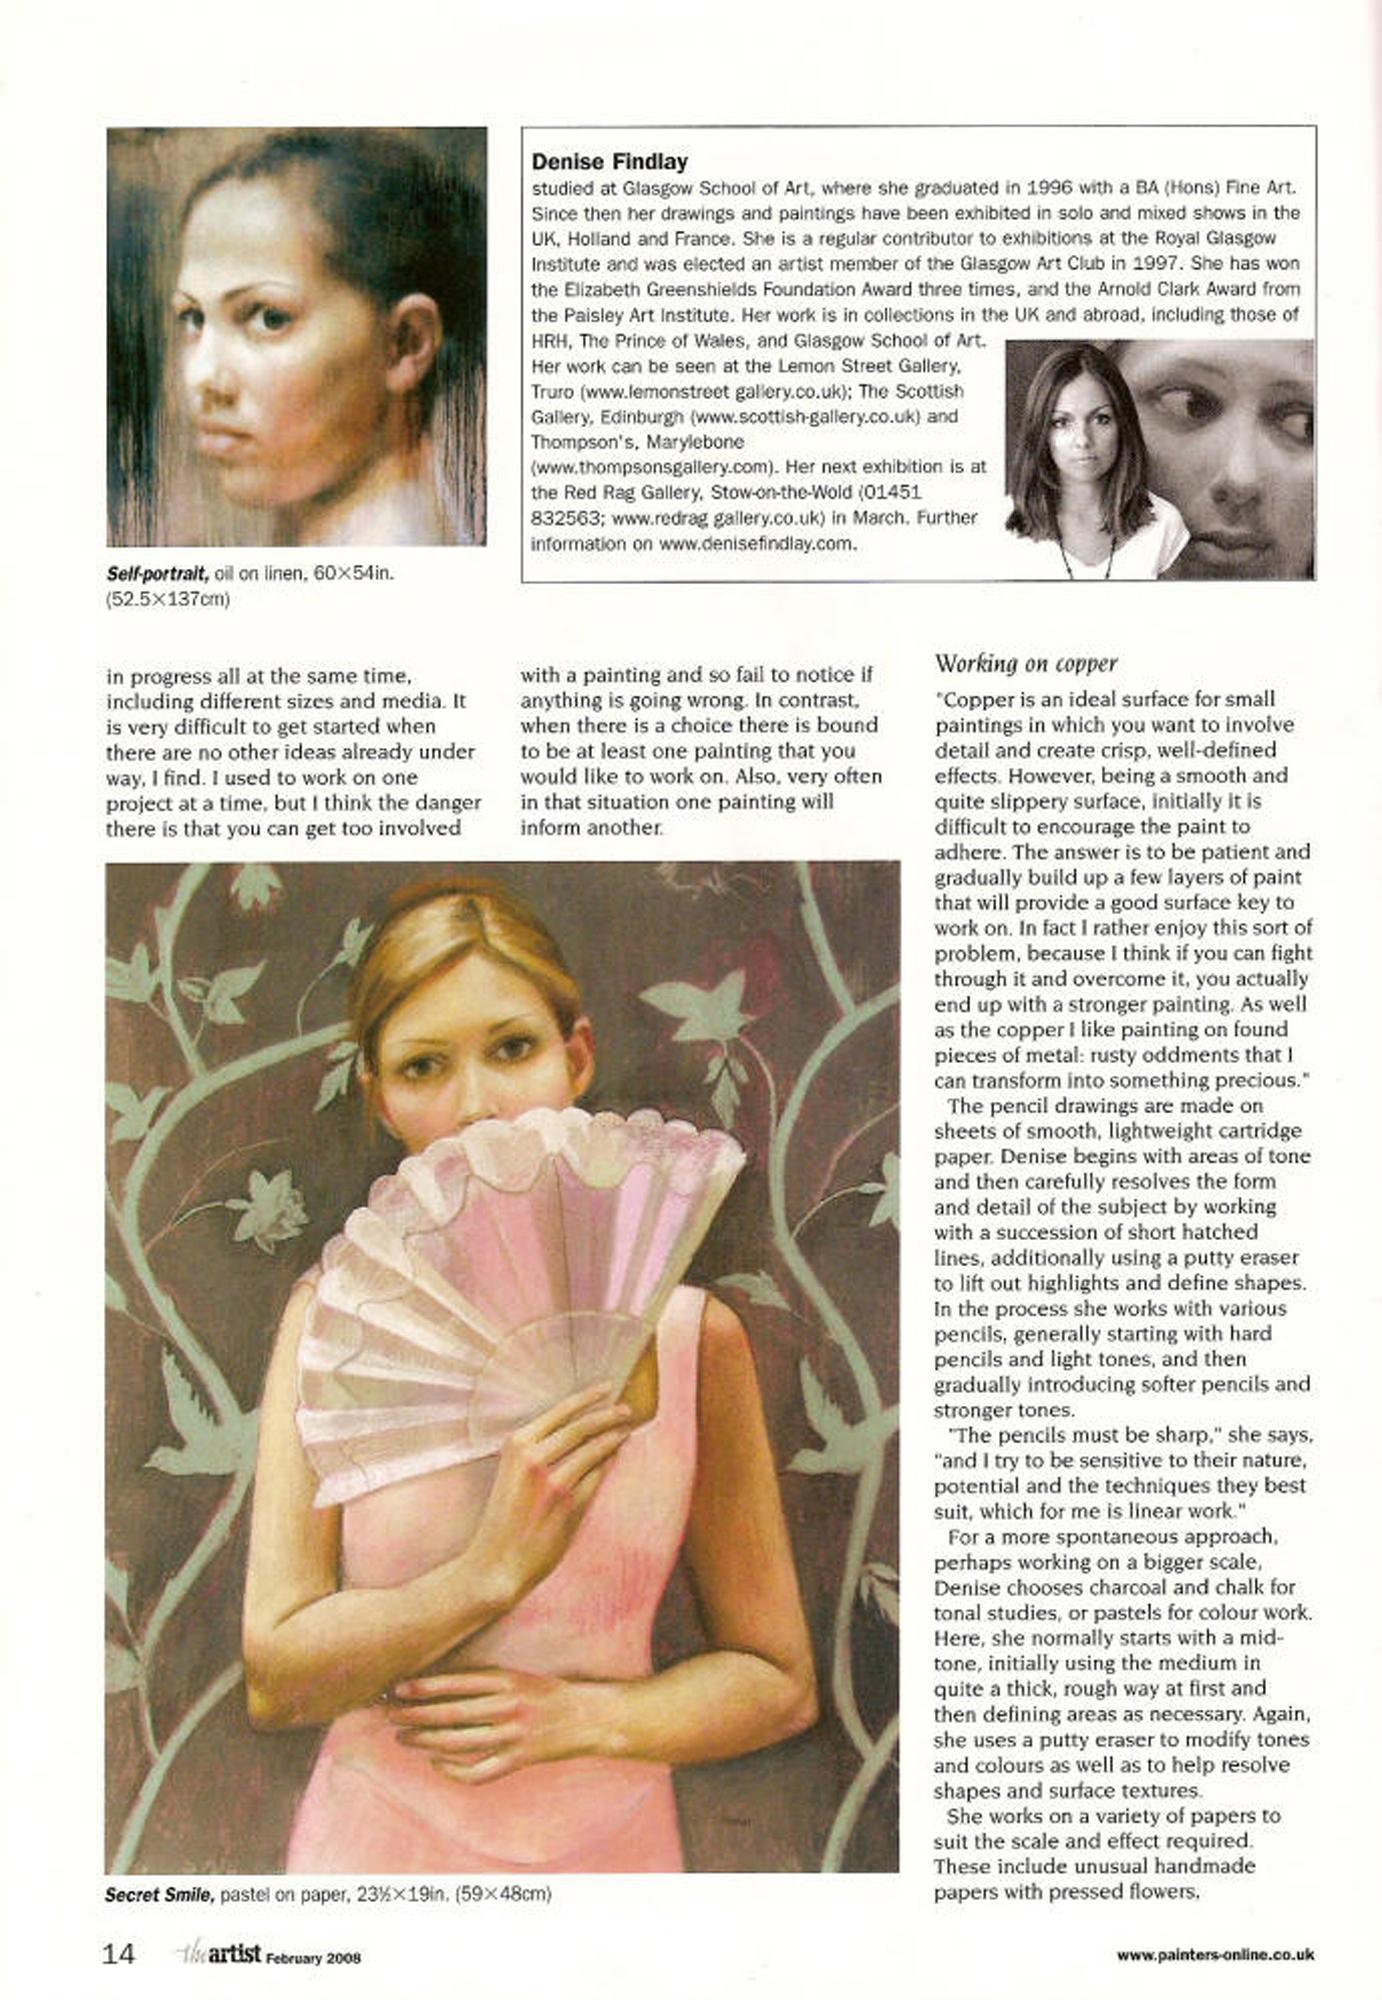 The Artist, February 2008, p.3